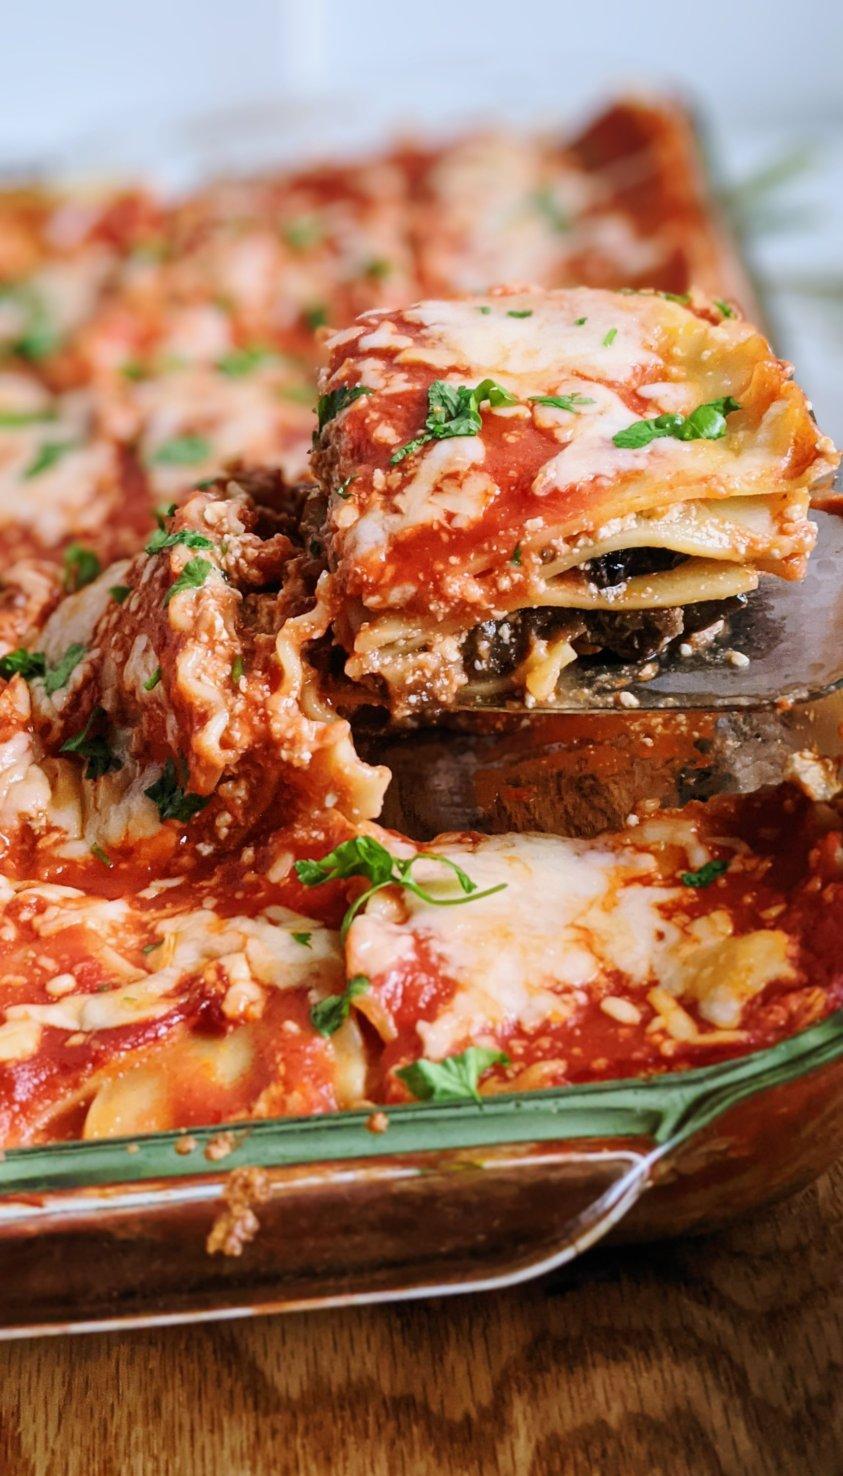 dairy free eggplant lasana recipe vegan lasagne with eggplant alla normal eggplant parmesan lasagna gluten free vegetarian recipe